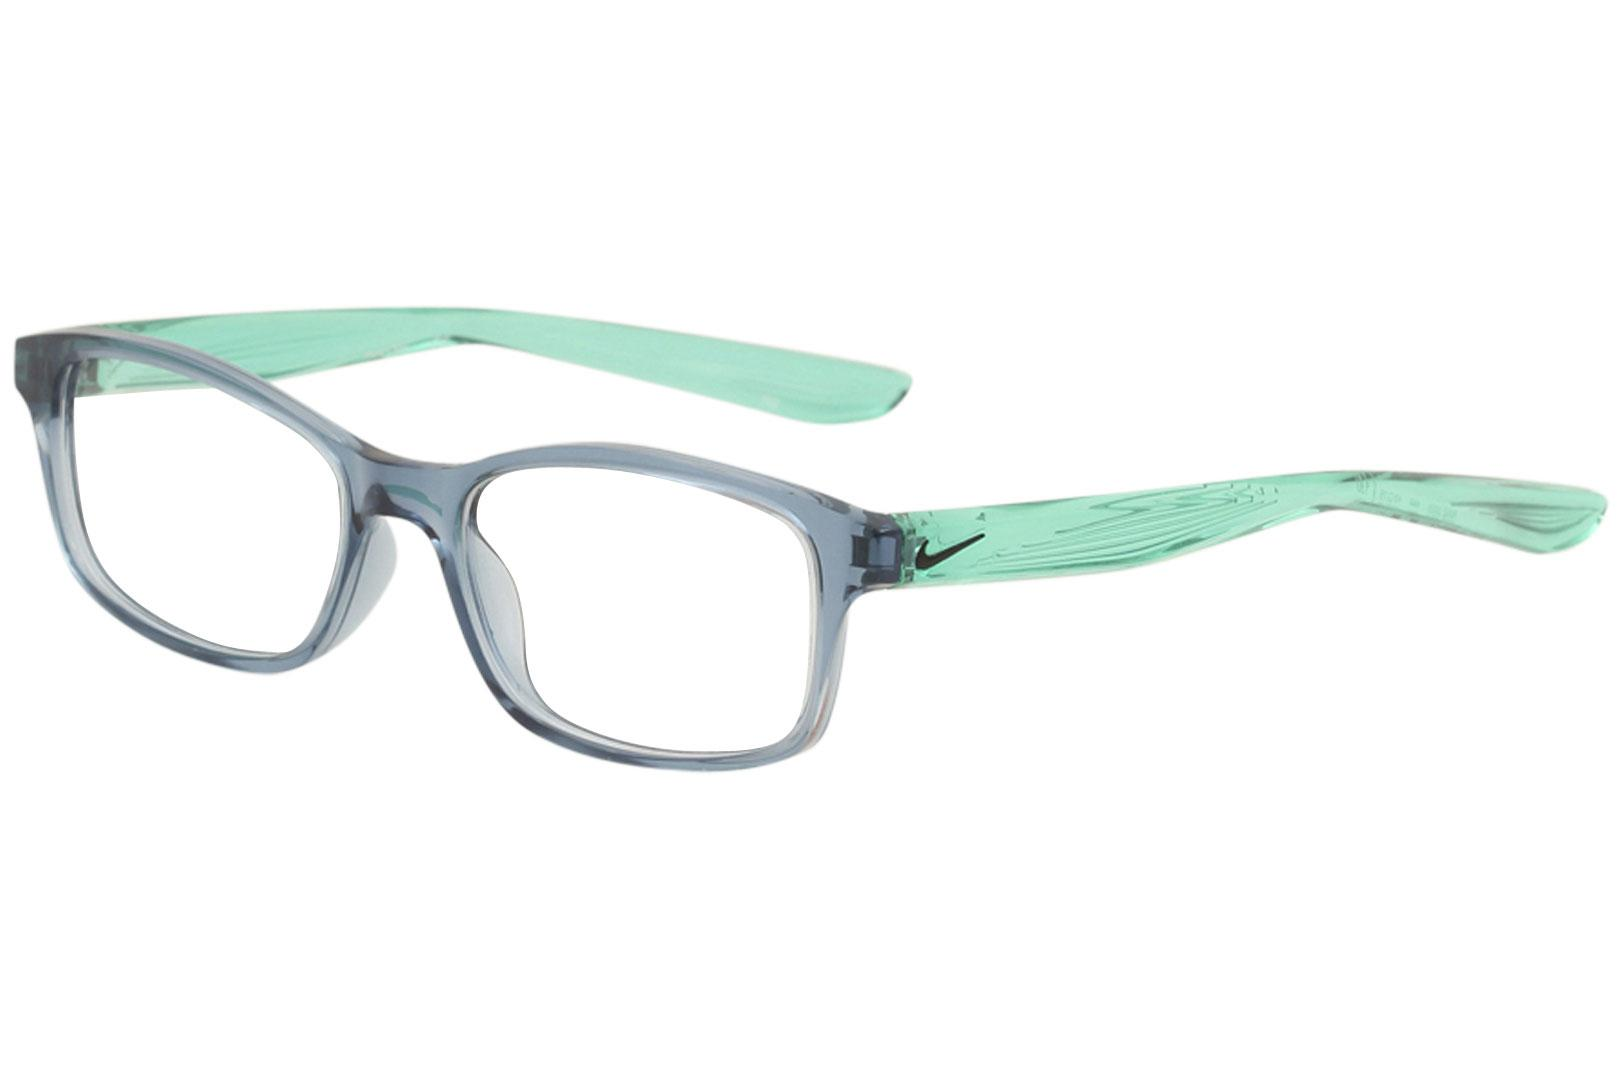 904fce4fa00 Nike Youth Boy s Eyeglasses 5005 Full Rim Optical Frame